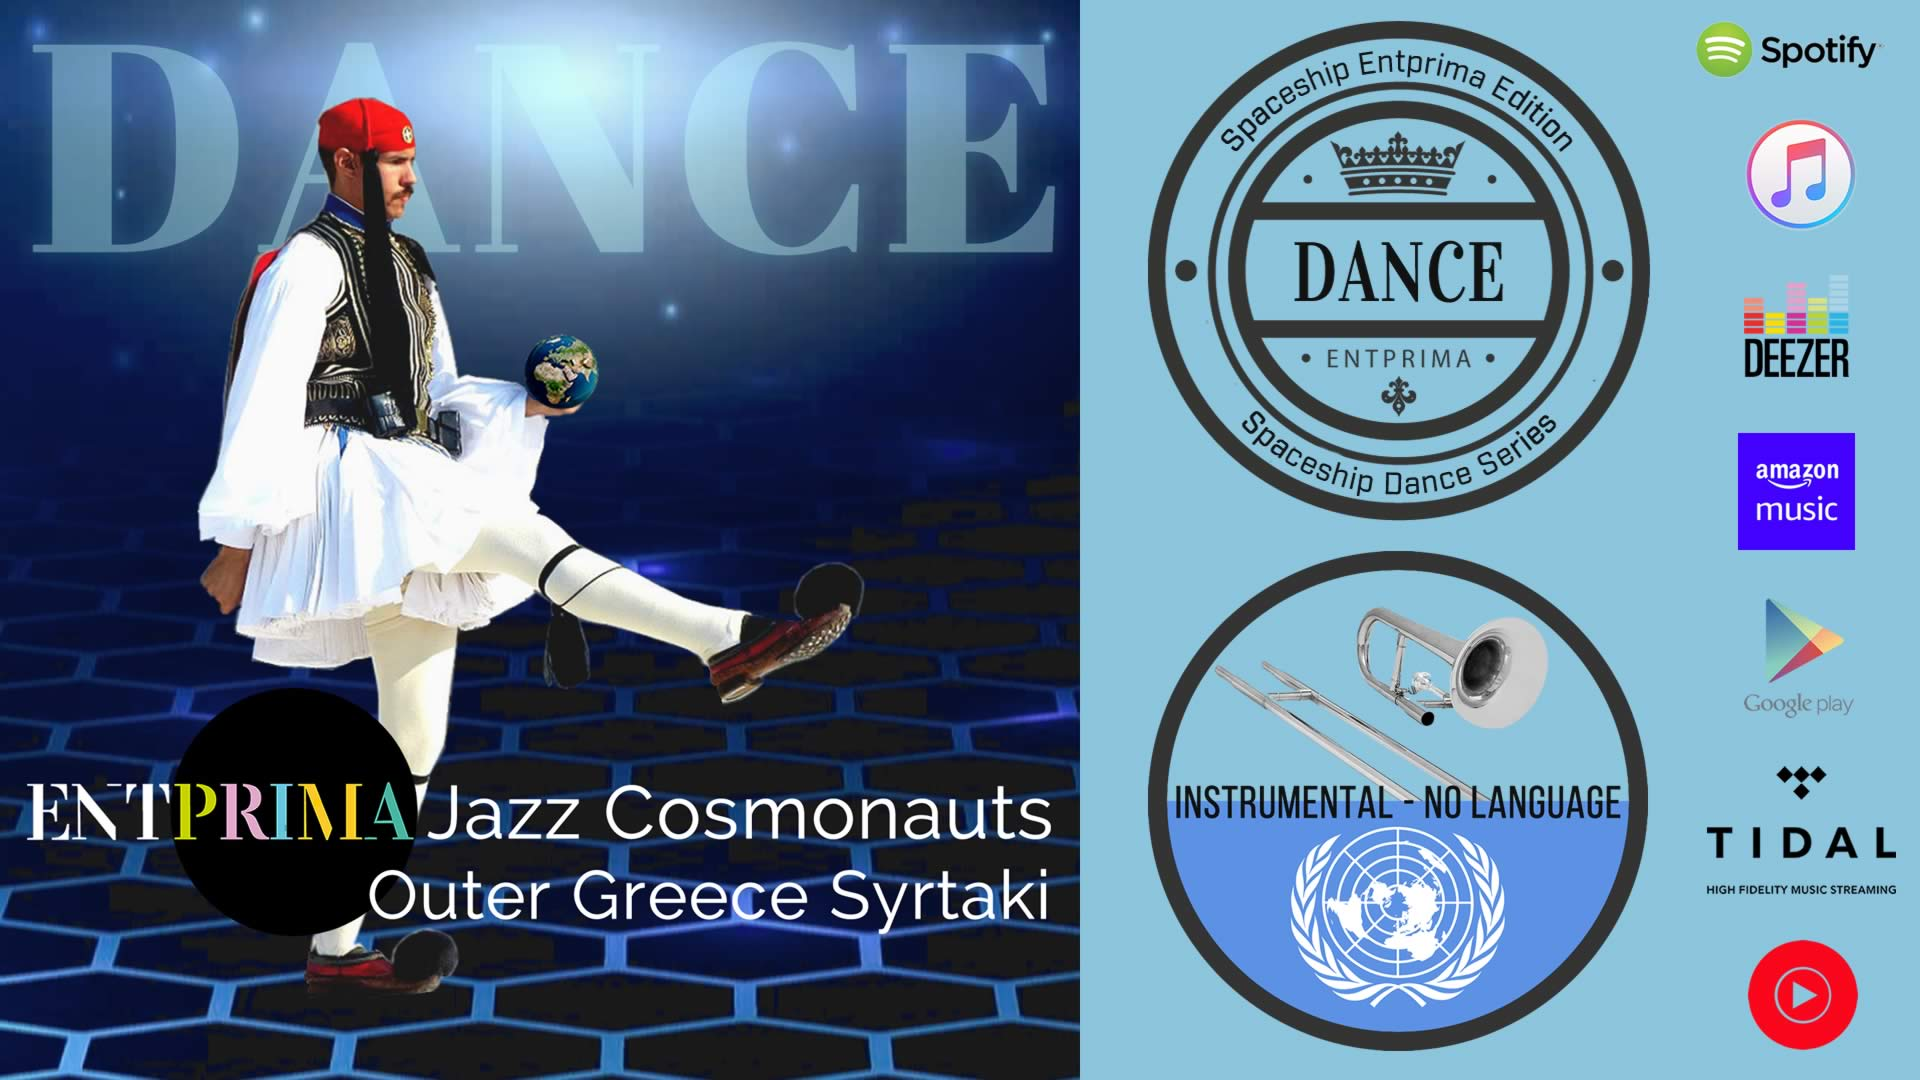 Äußeres Griechenland Syrtaki - Entprima Jazz-Kosmonauten